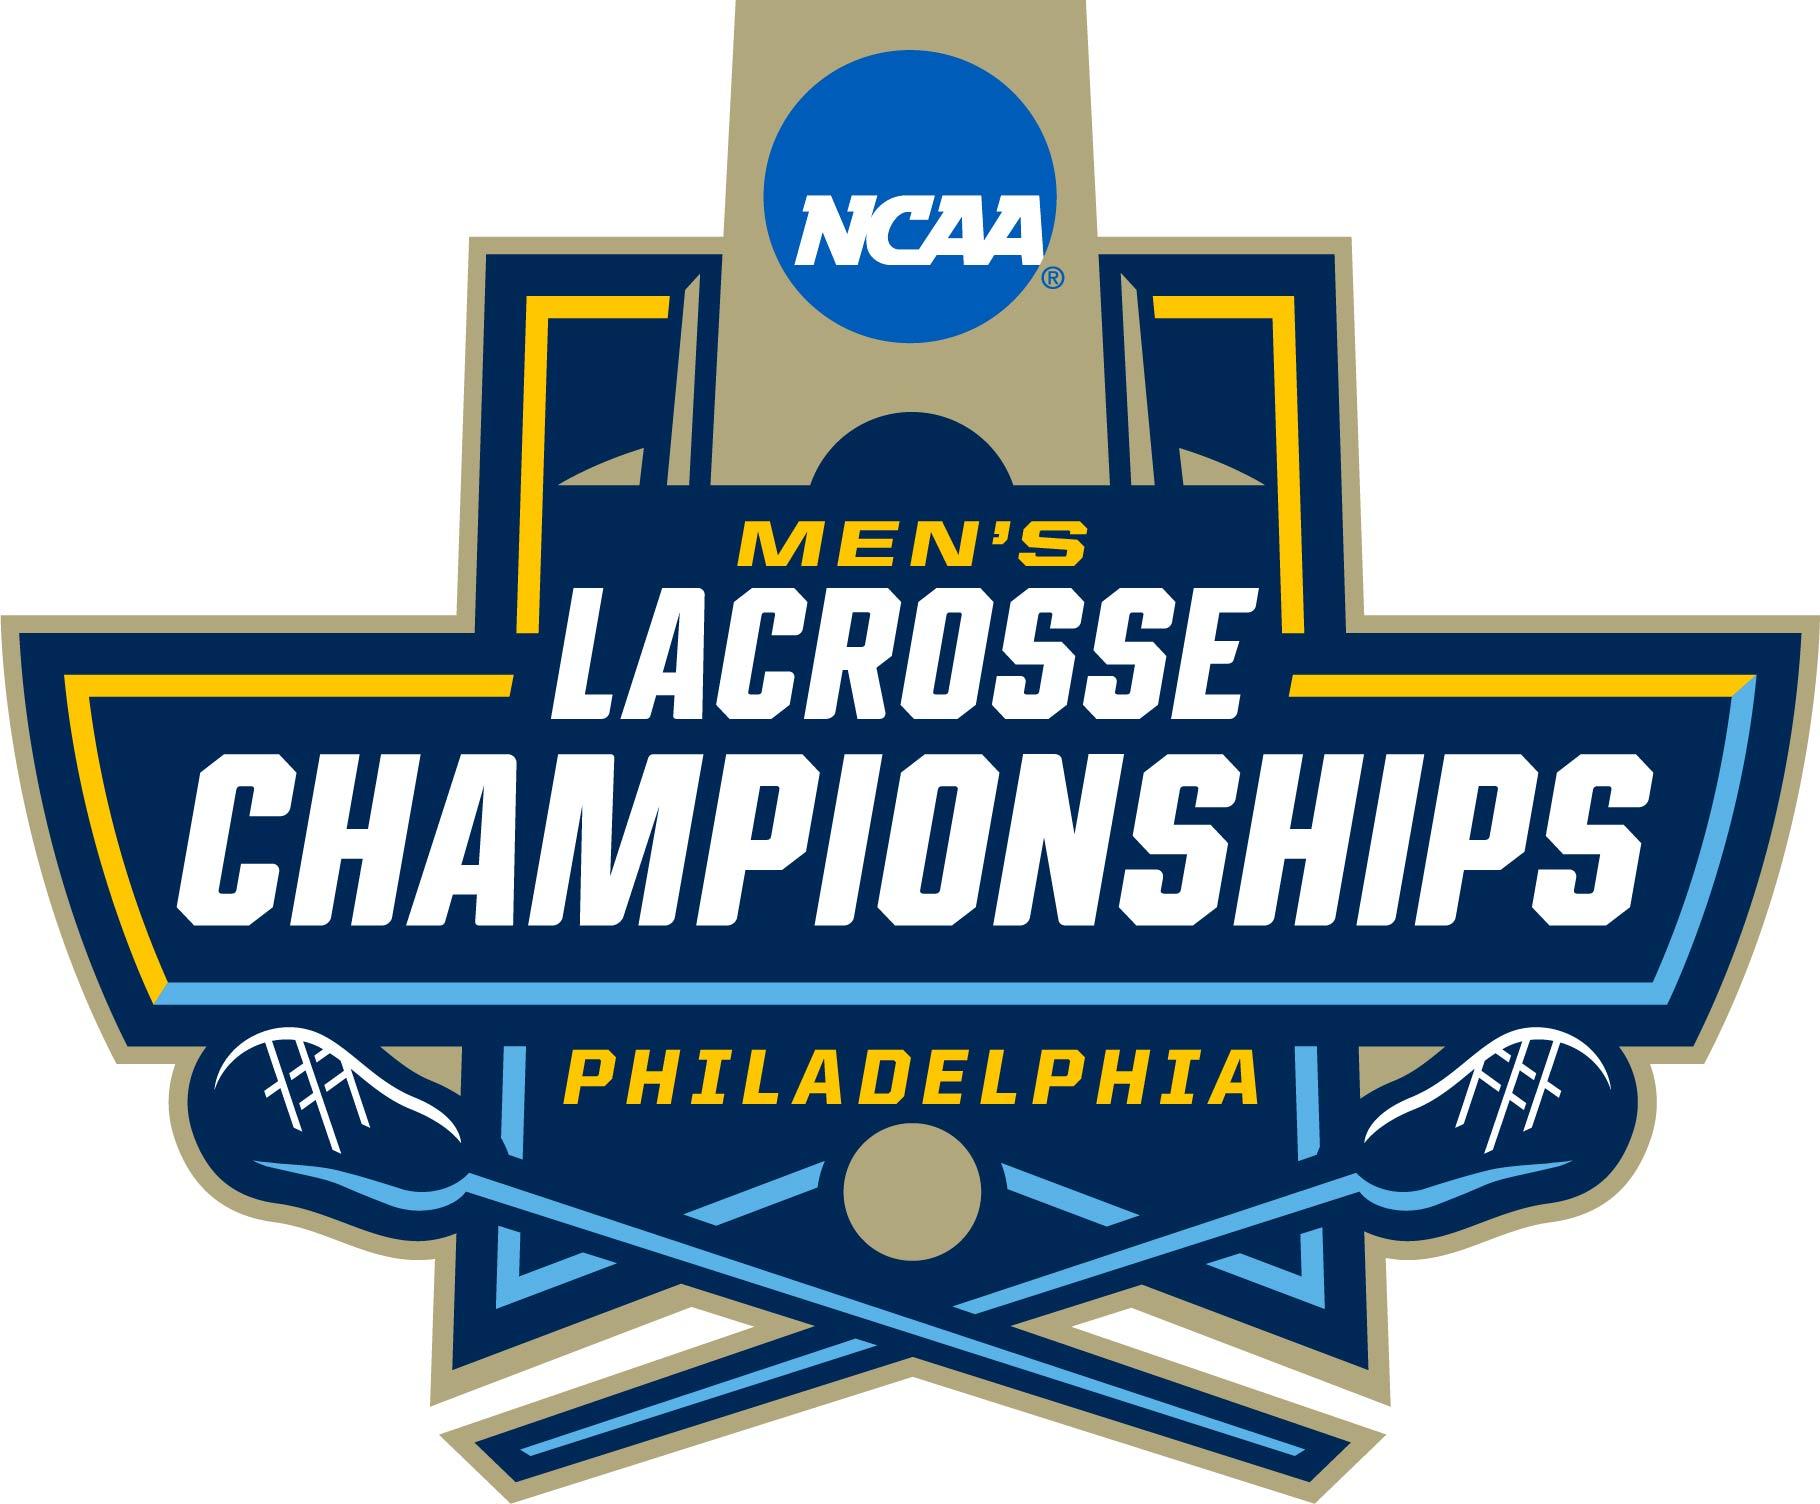 Men's Lacrosse Championships